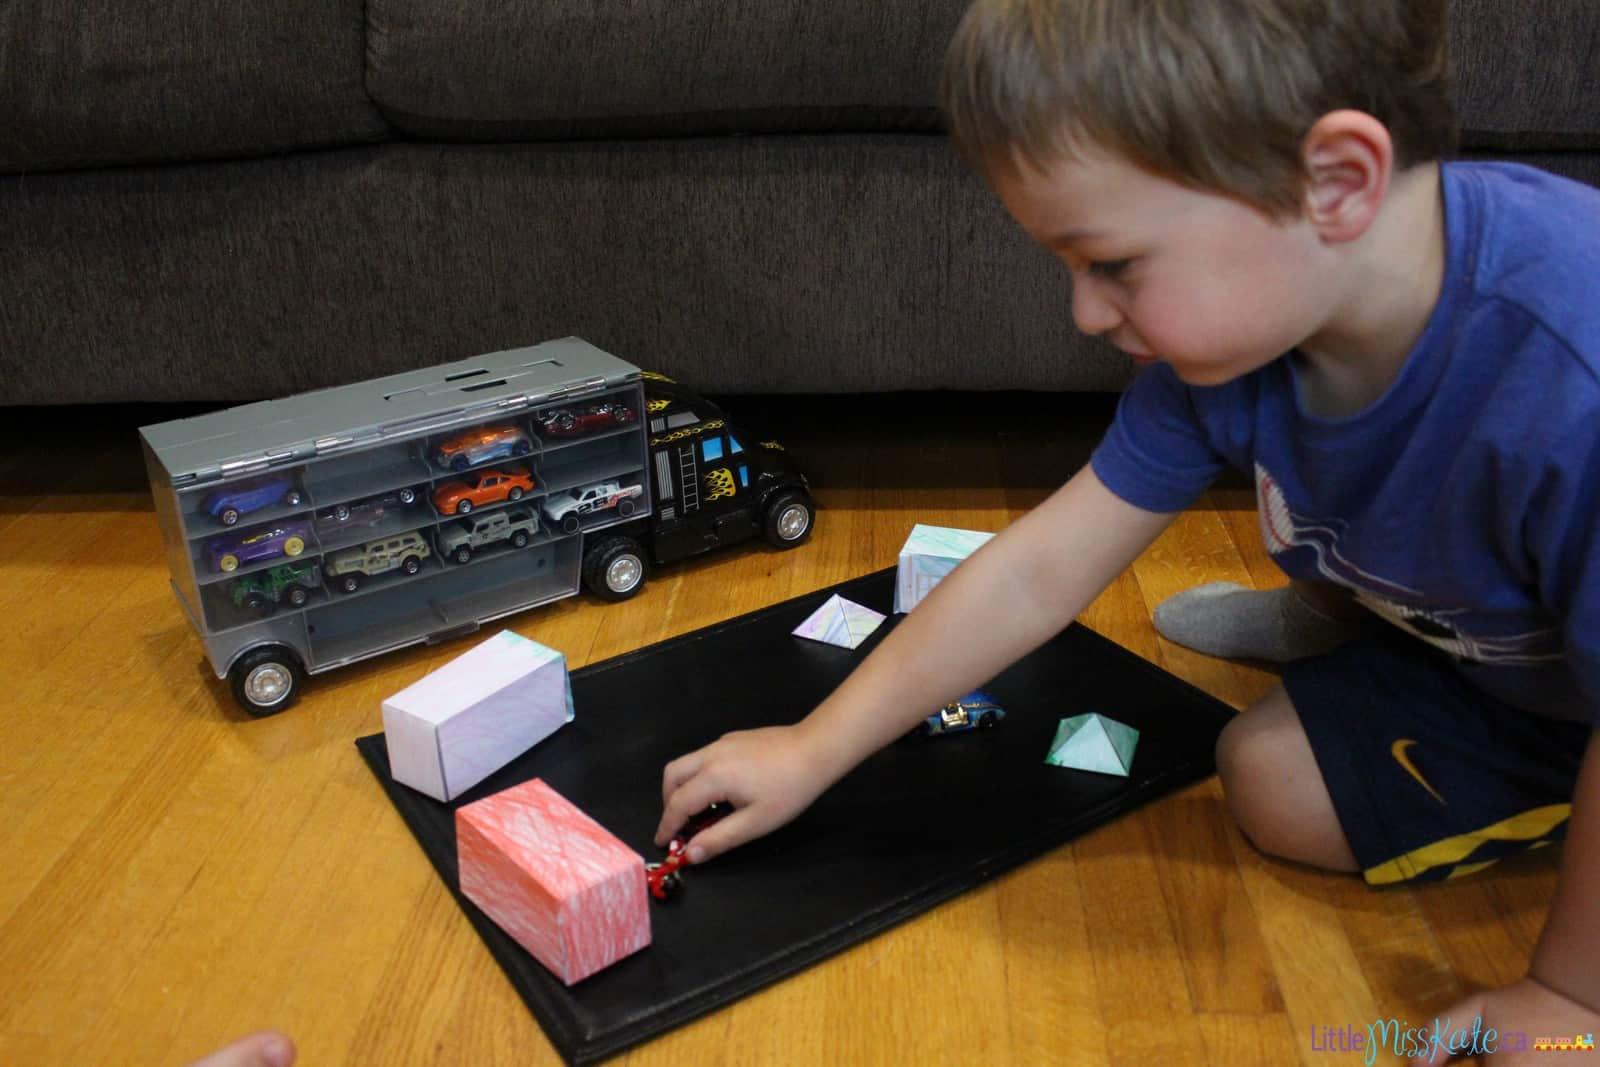 Educational Game Ideas for Boys